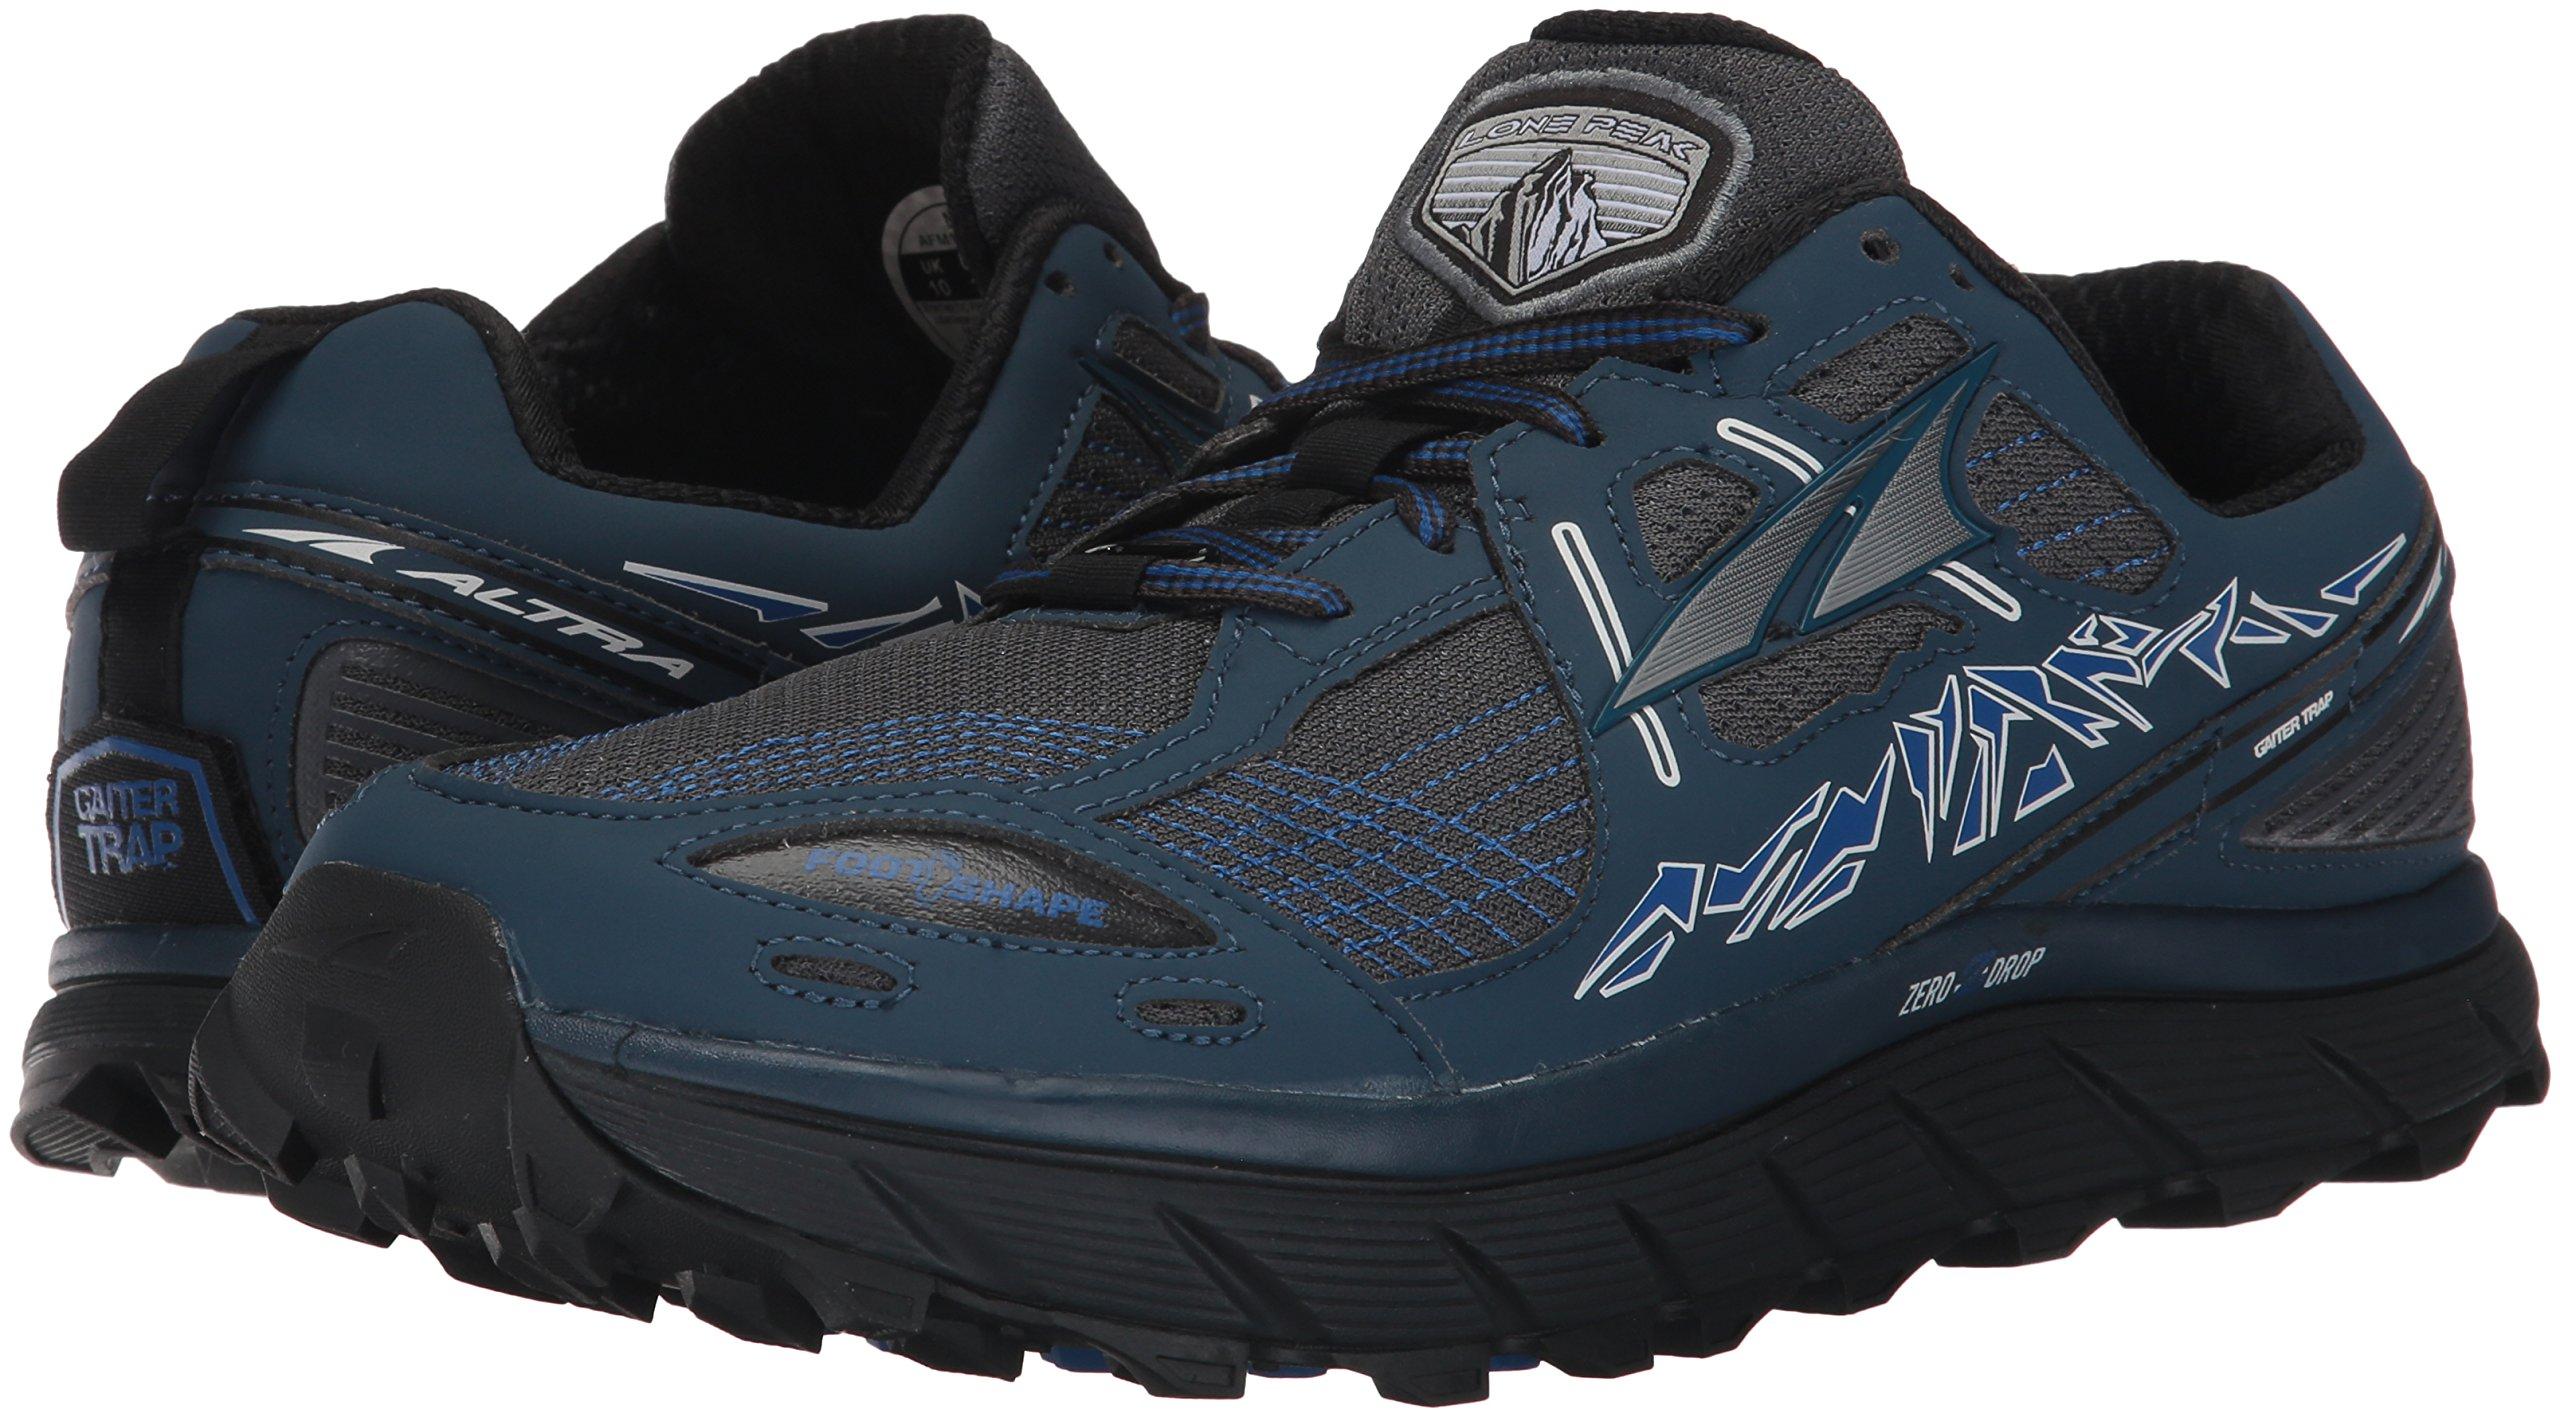 Altra Men's Lone Peak 3.5 Trail Running Shoe, Blue, 12 D US by Altra (Image #6)